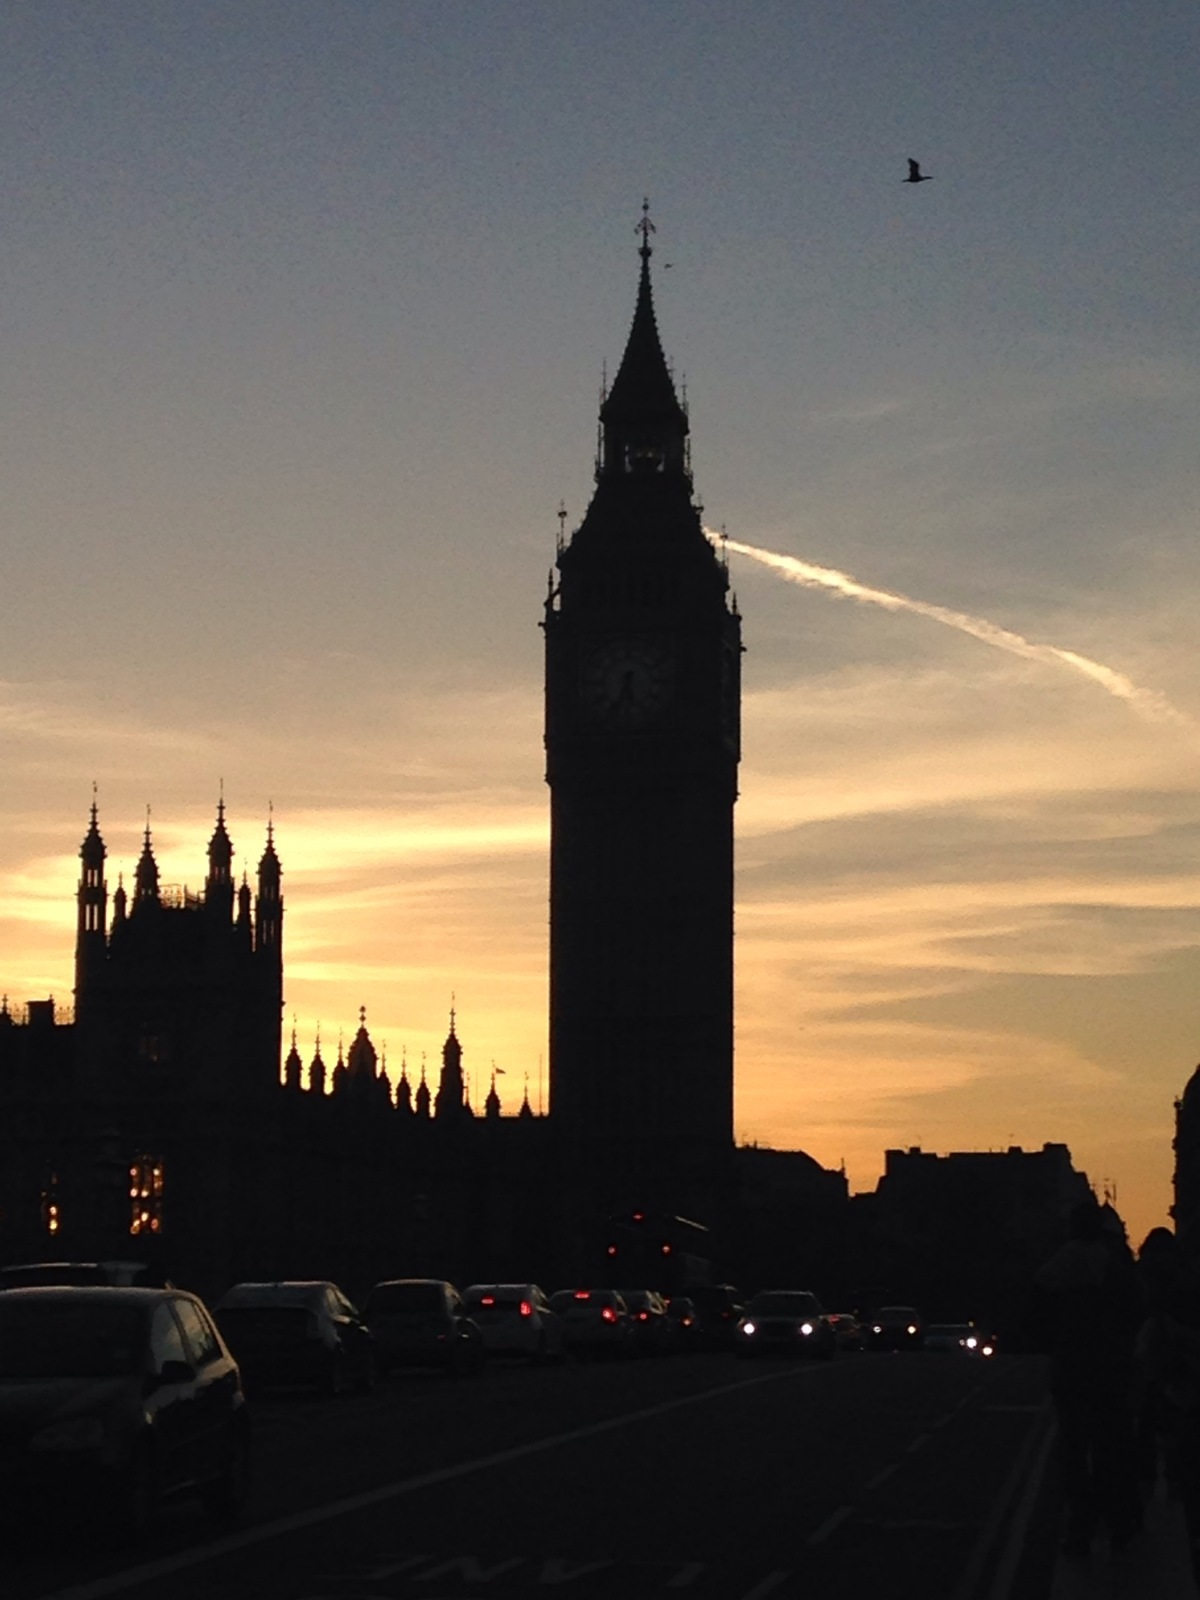 I LOVE LONDON!!